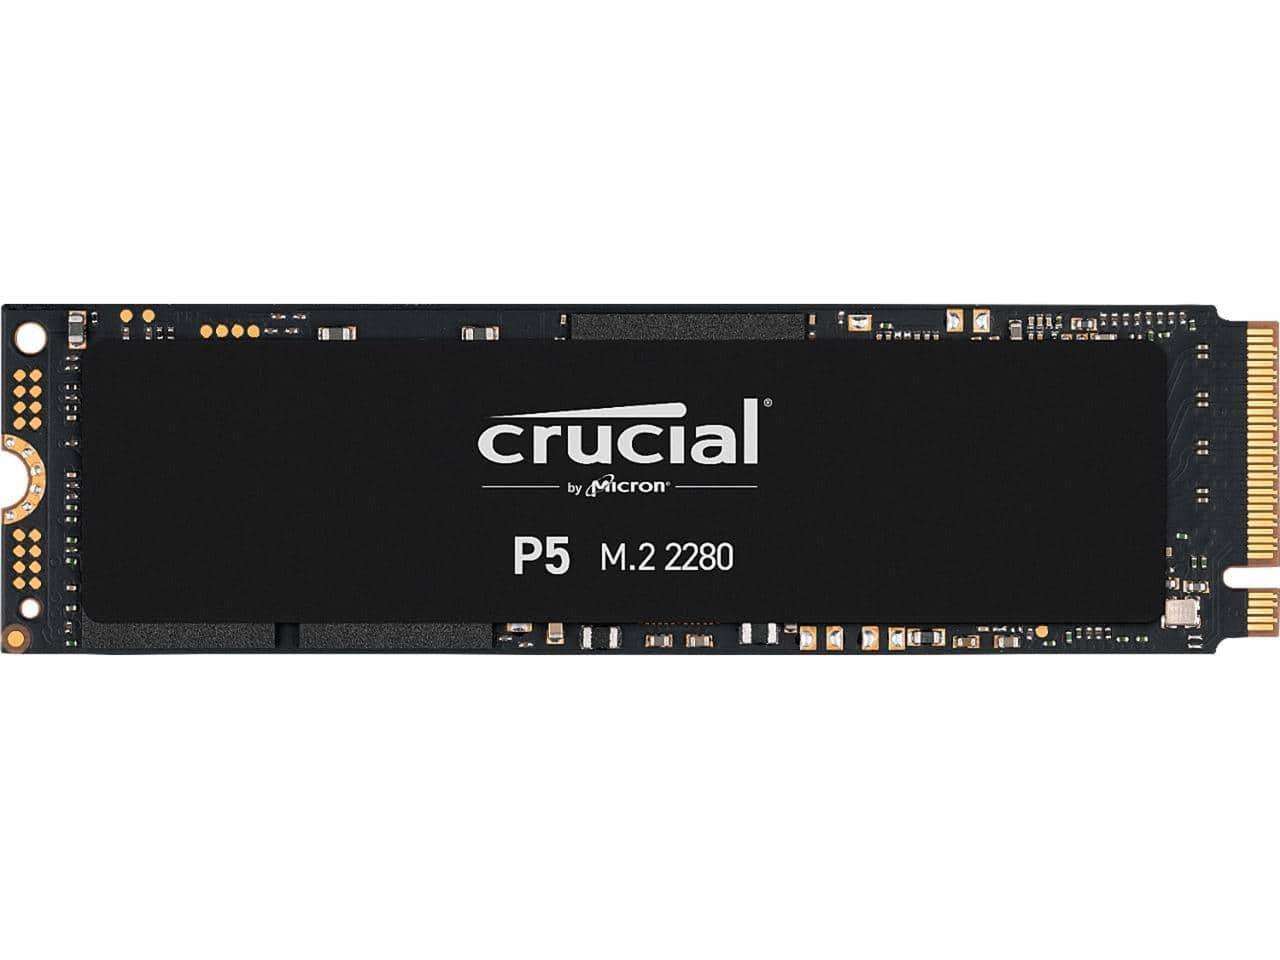 1TB Crucial P5 NVMe SSD $102 @Newegg; 1TB P2 / $89;  500GB P2 / $46AC;  500GB Samsung 980 / $55AC; 500GB T7 / $60AC and more